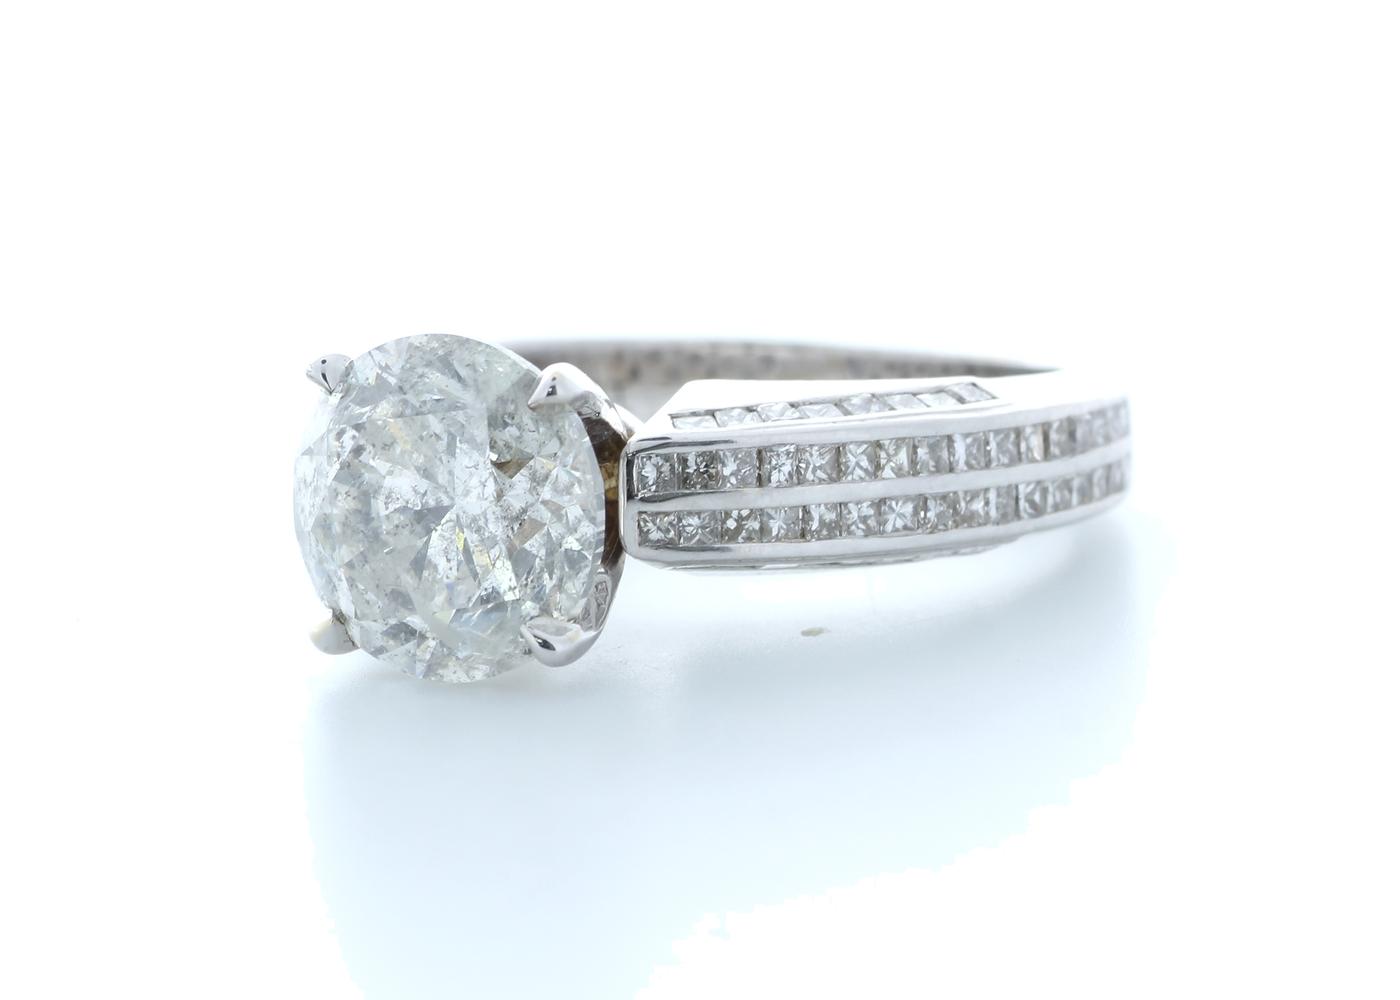 18ct White Gold Diamond Ring 4.51 (3.57) Carats - Image 2 of 5